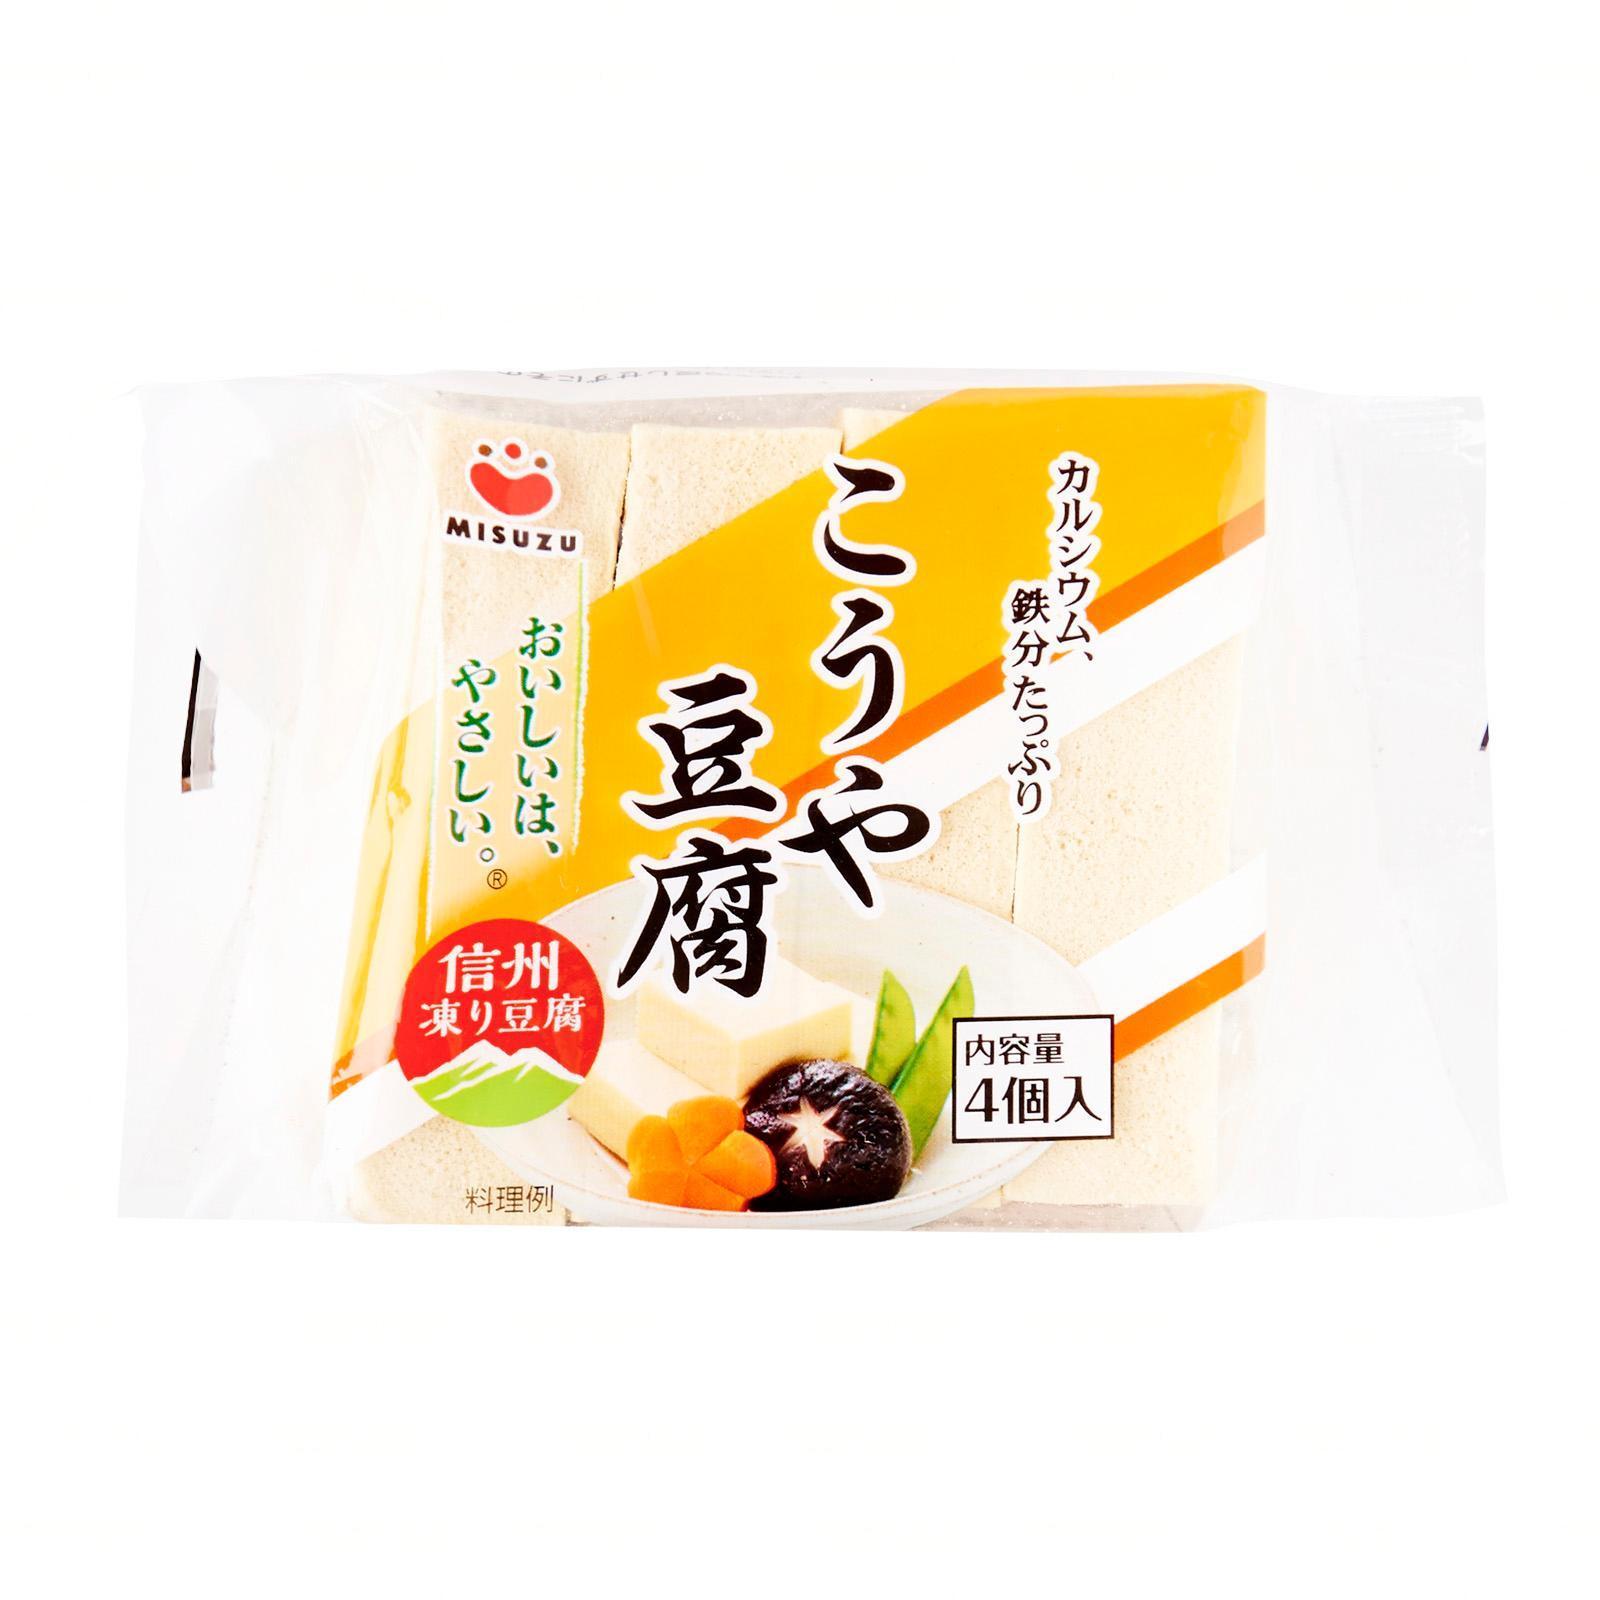 Misuzu Traditional Style Kouya Freeze Dried Tofu (Beancurd)